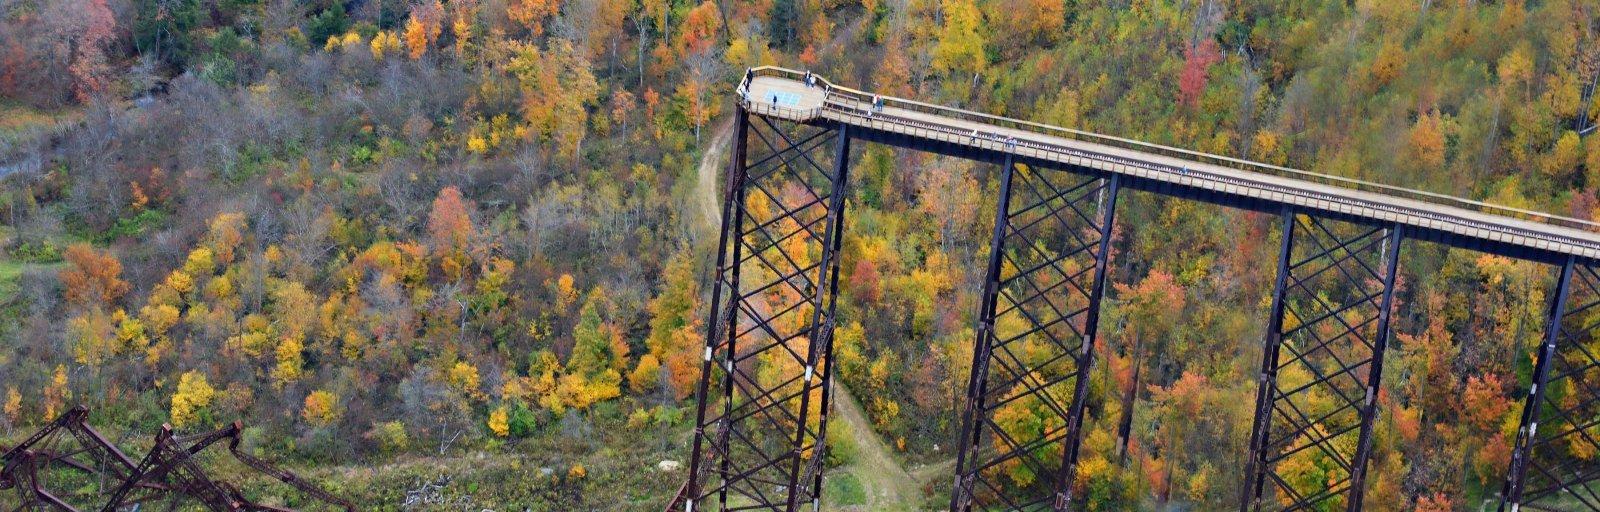 Banner Kinzua Bridge Aerial View Fall 1600 Allegheny